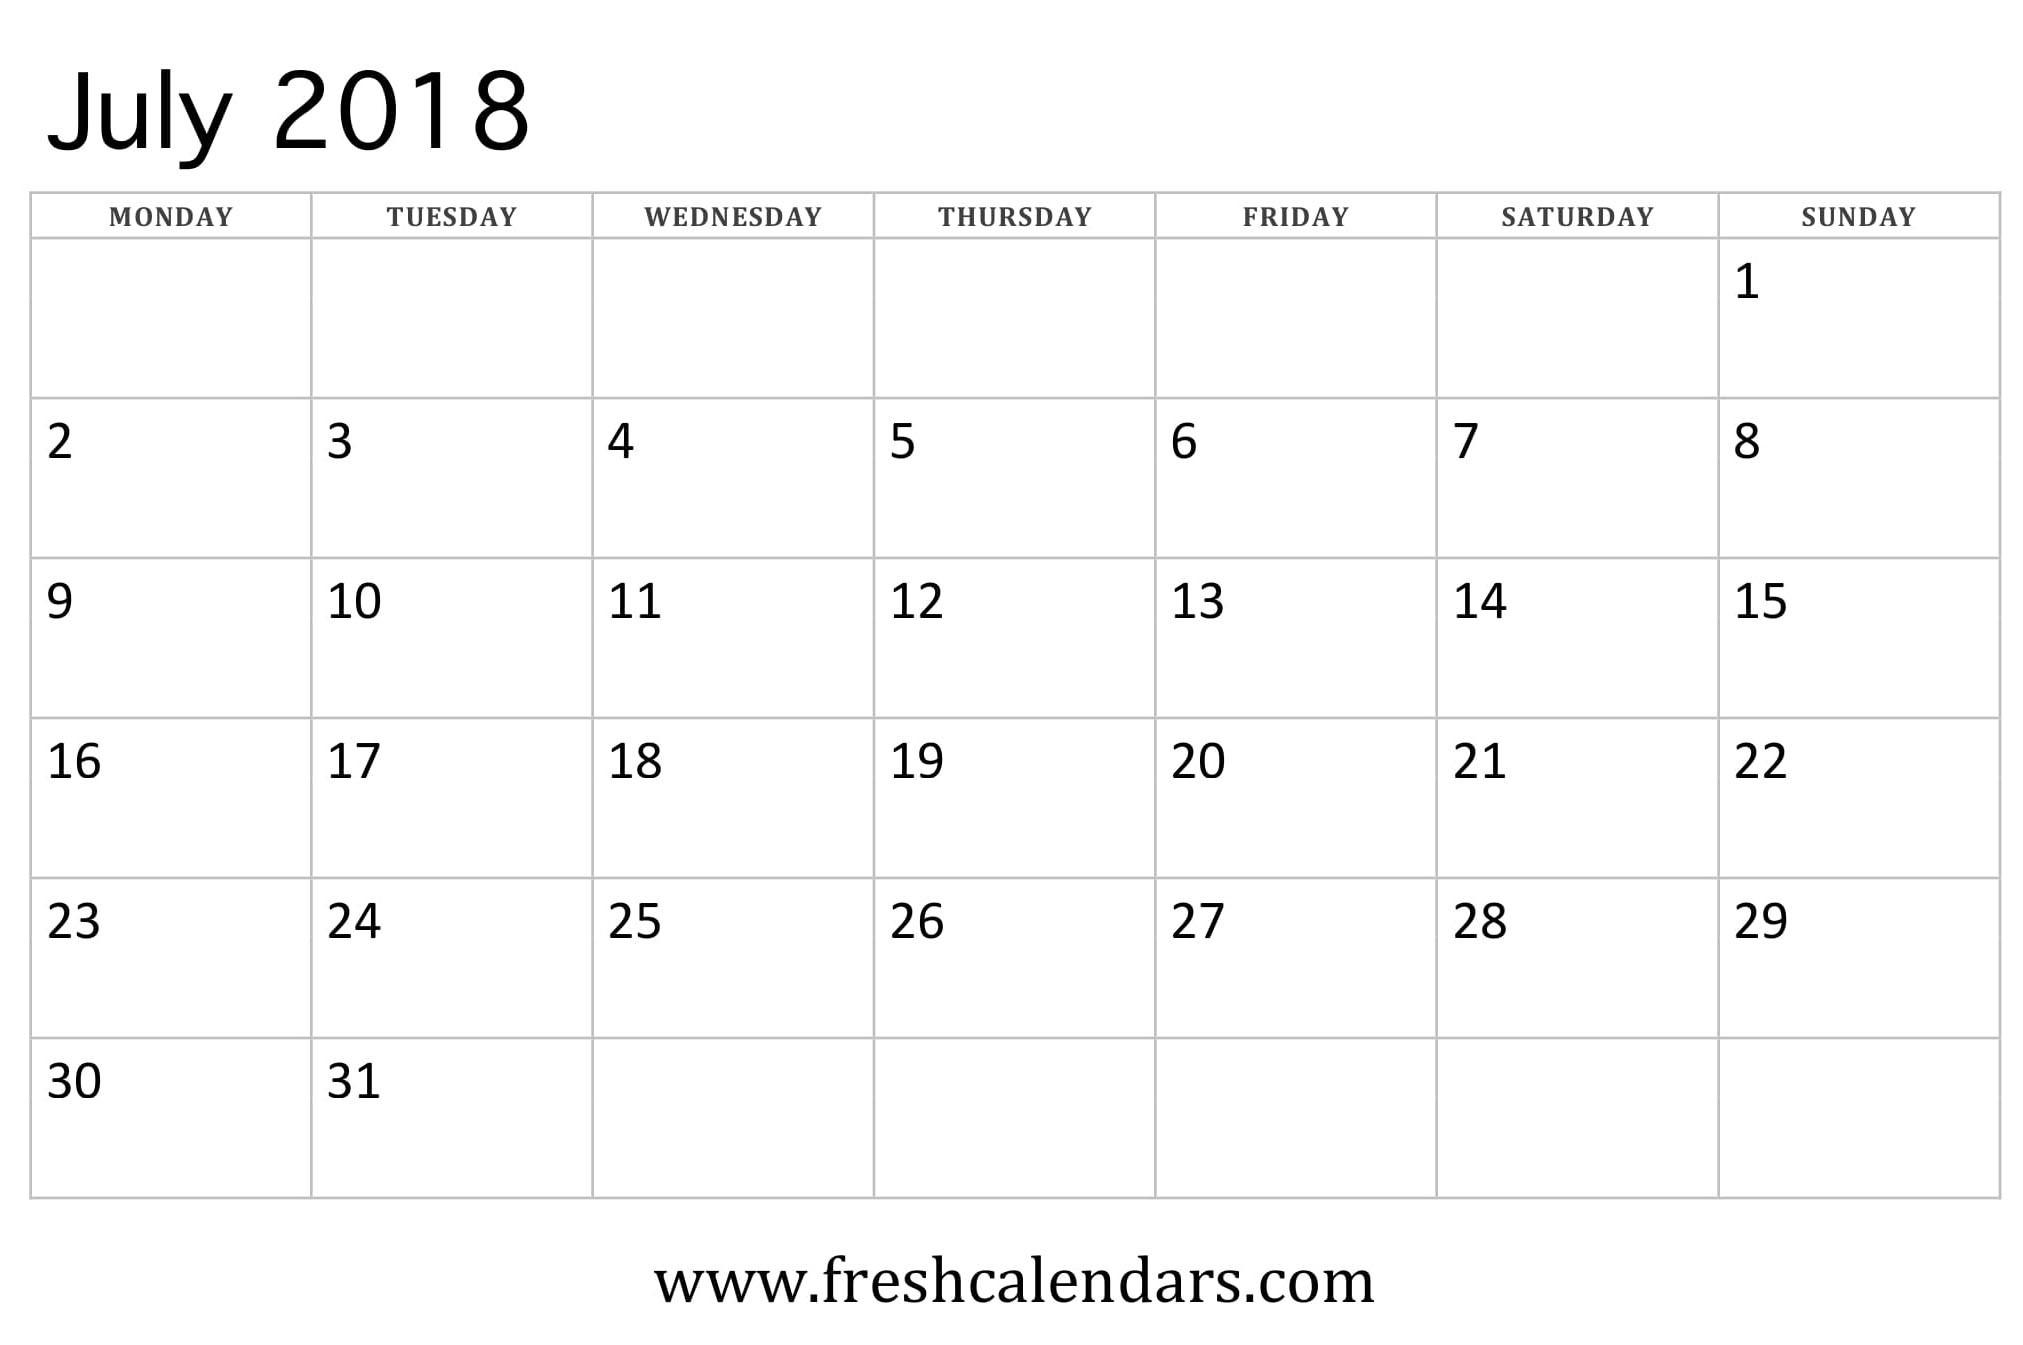 July 2018 Calendar Printable - Fresh Calendars-Monthly Calendar Starts On Monday